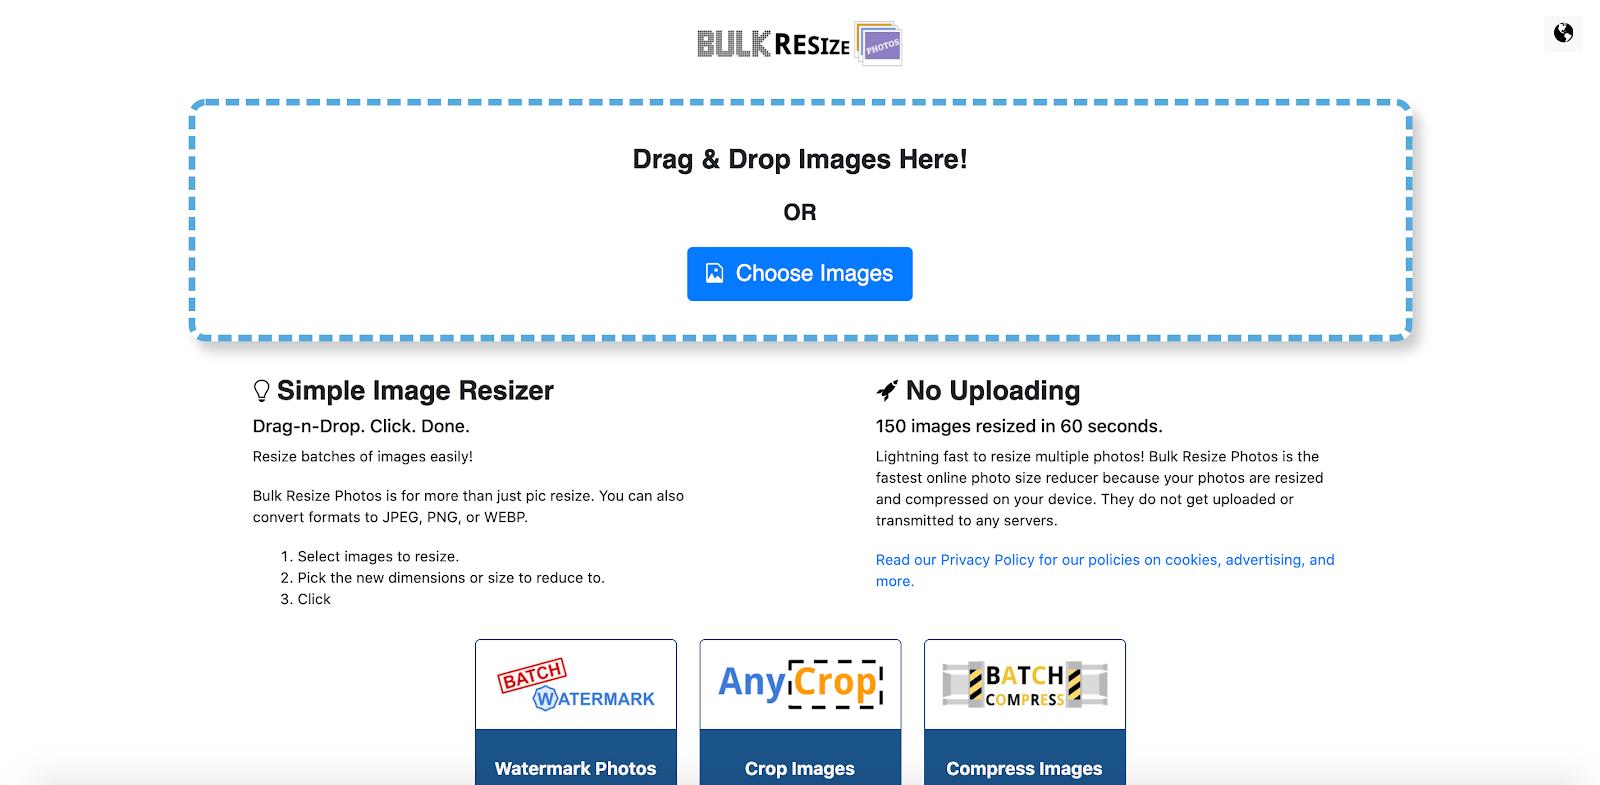 Programmi per ridimensionare immagini gratis online: bulk resize